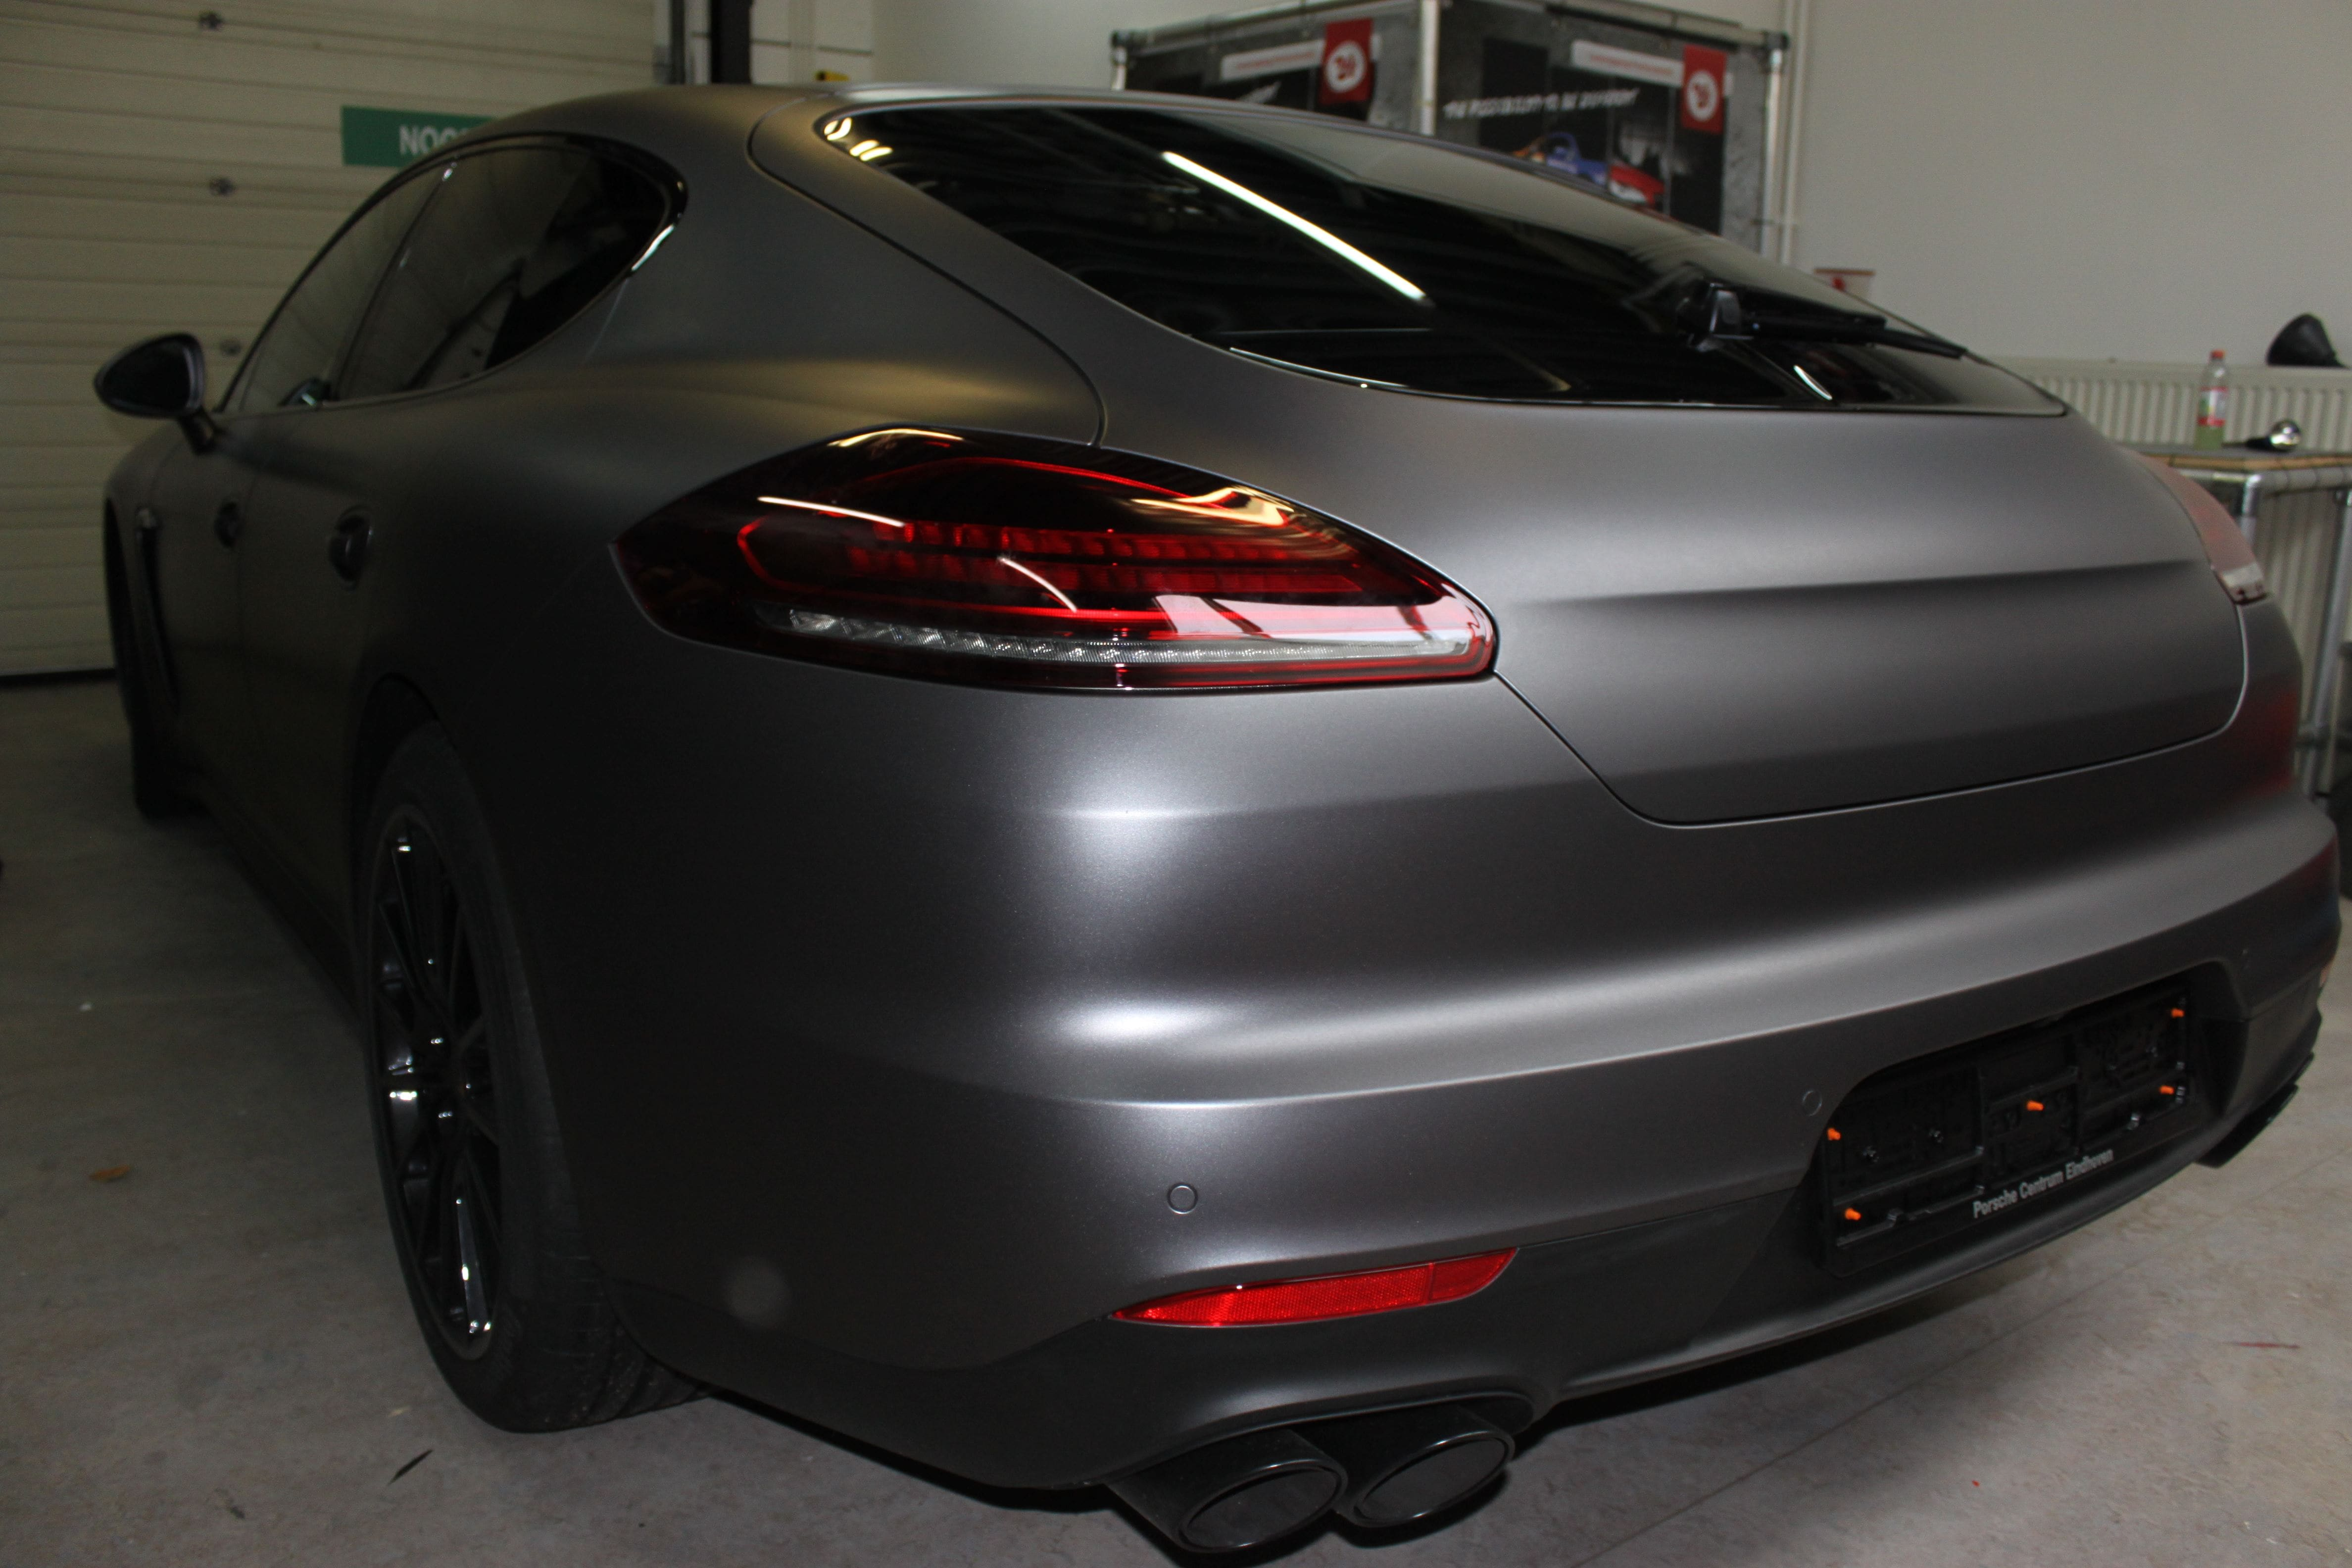 Porsche Panamera GTS Full Wrap in Gunpowder, Carwrapping door Wrapmyride.nu Foto-nr:7104, ©2021